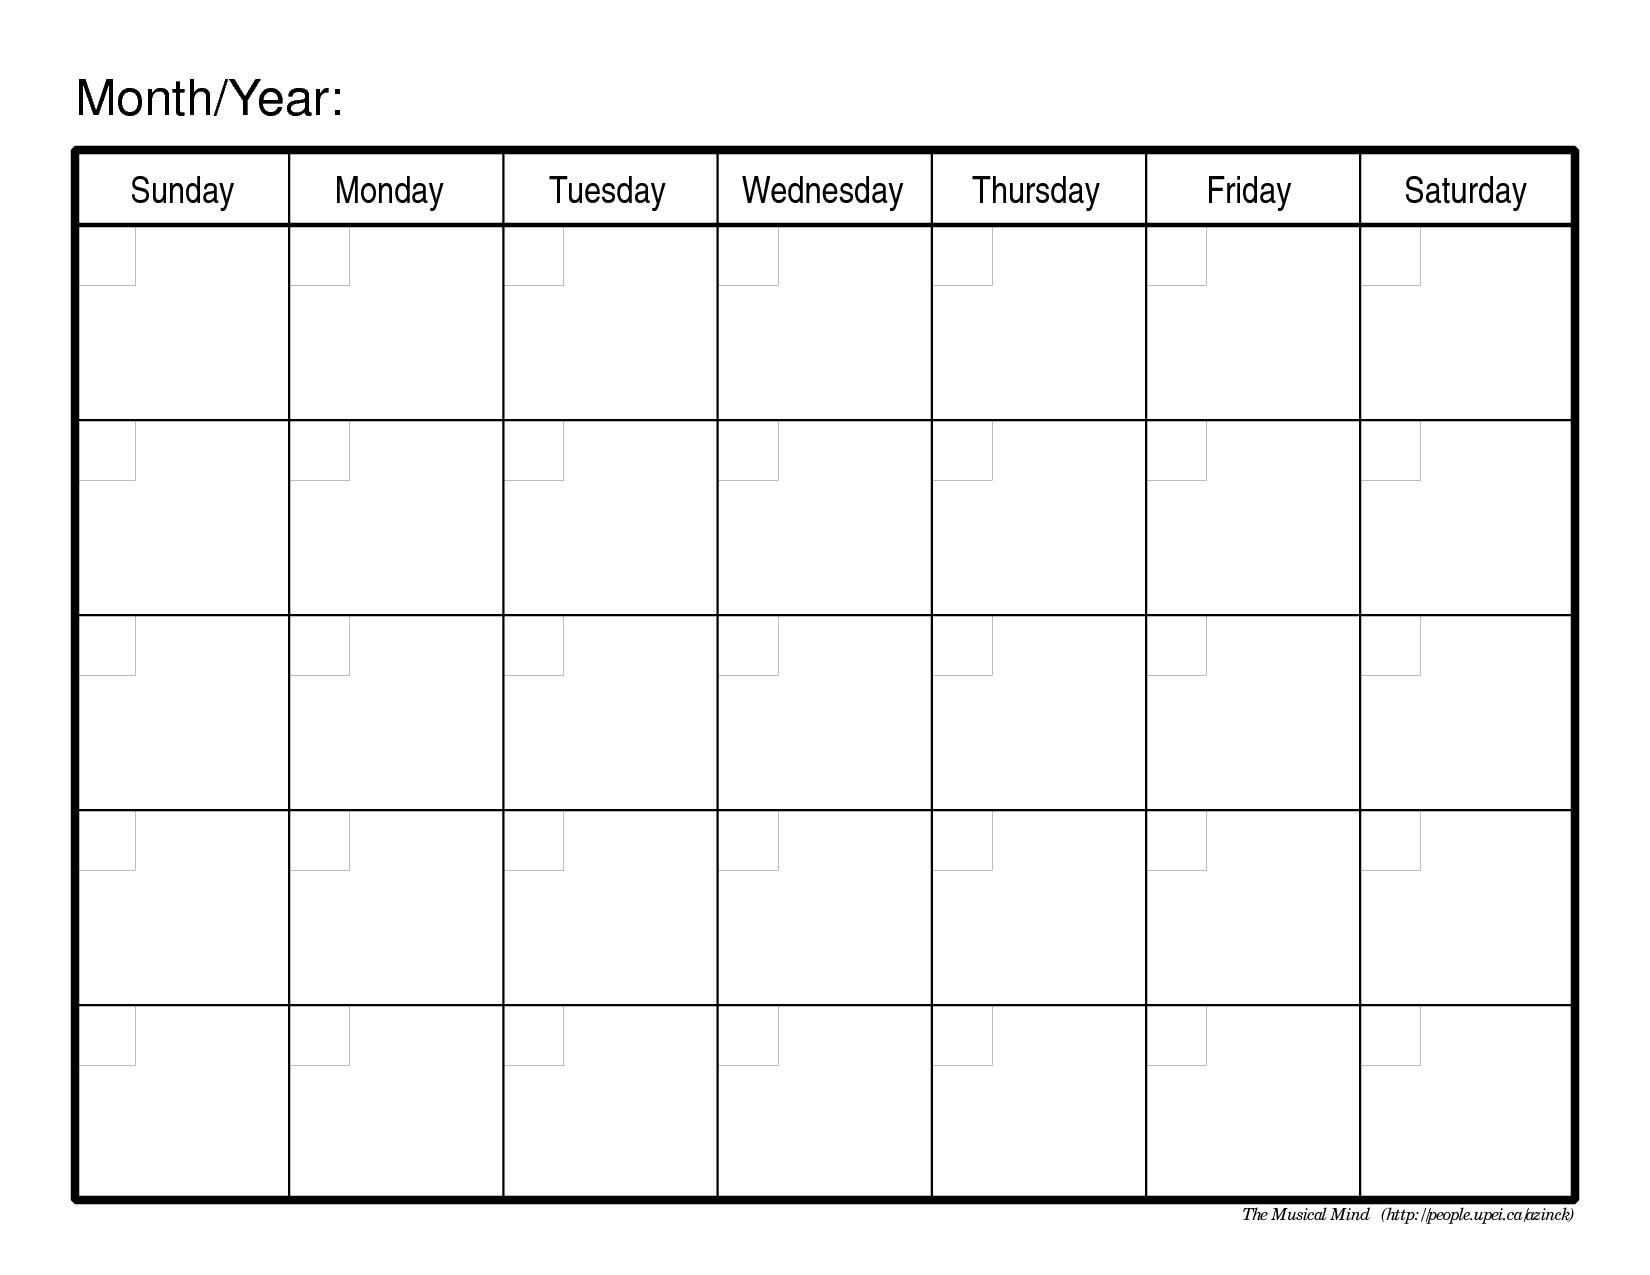 Monthly Calendar Template | Free Monthly Calendar, Blank